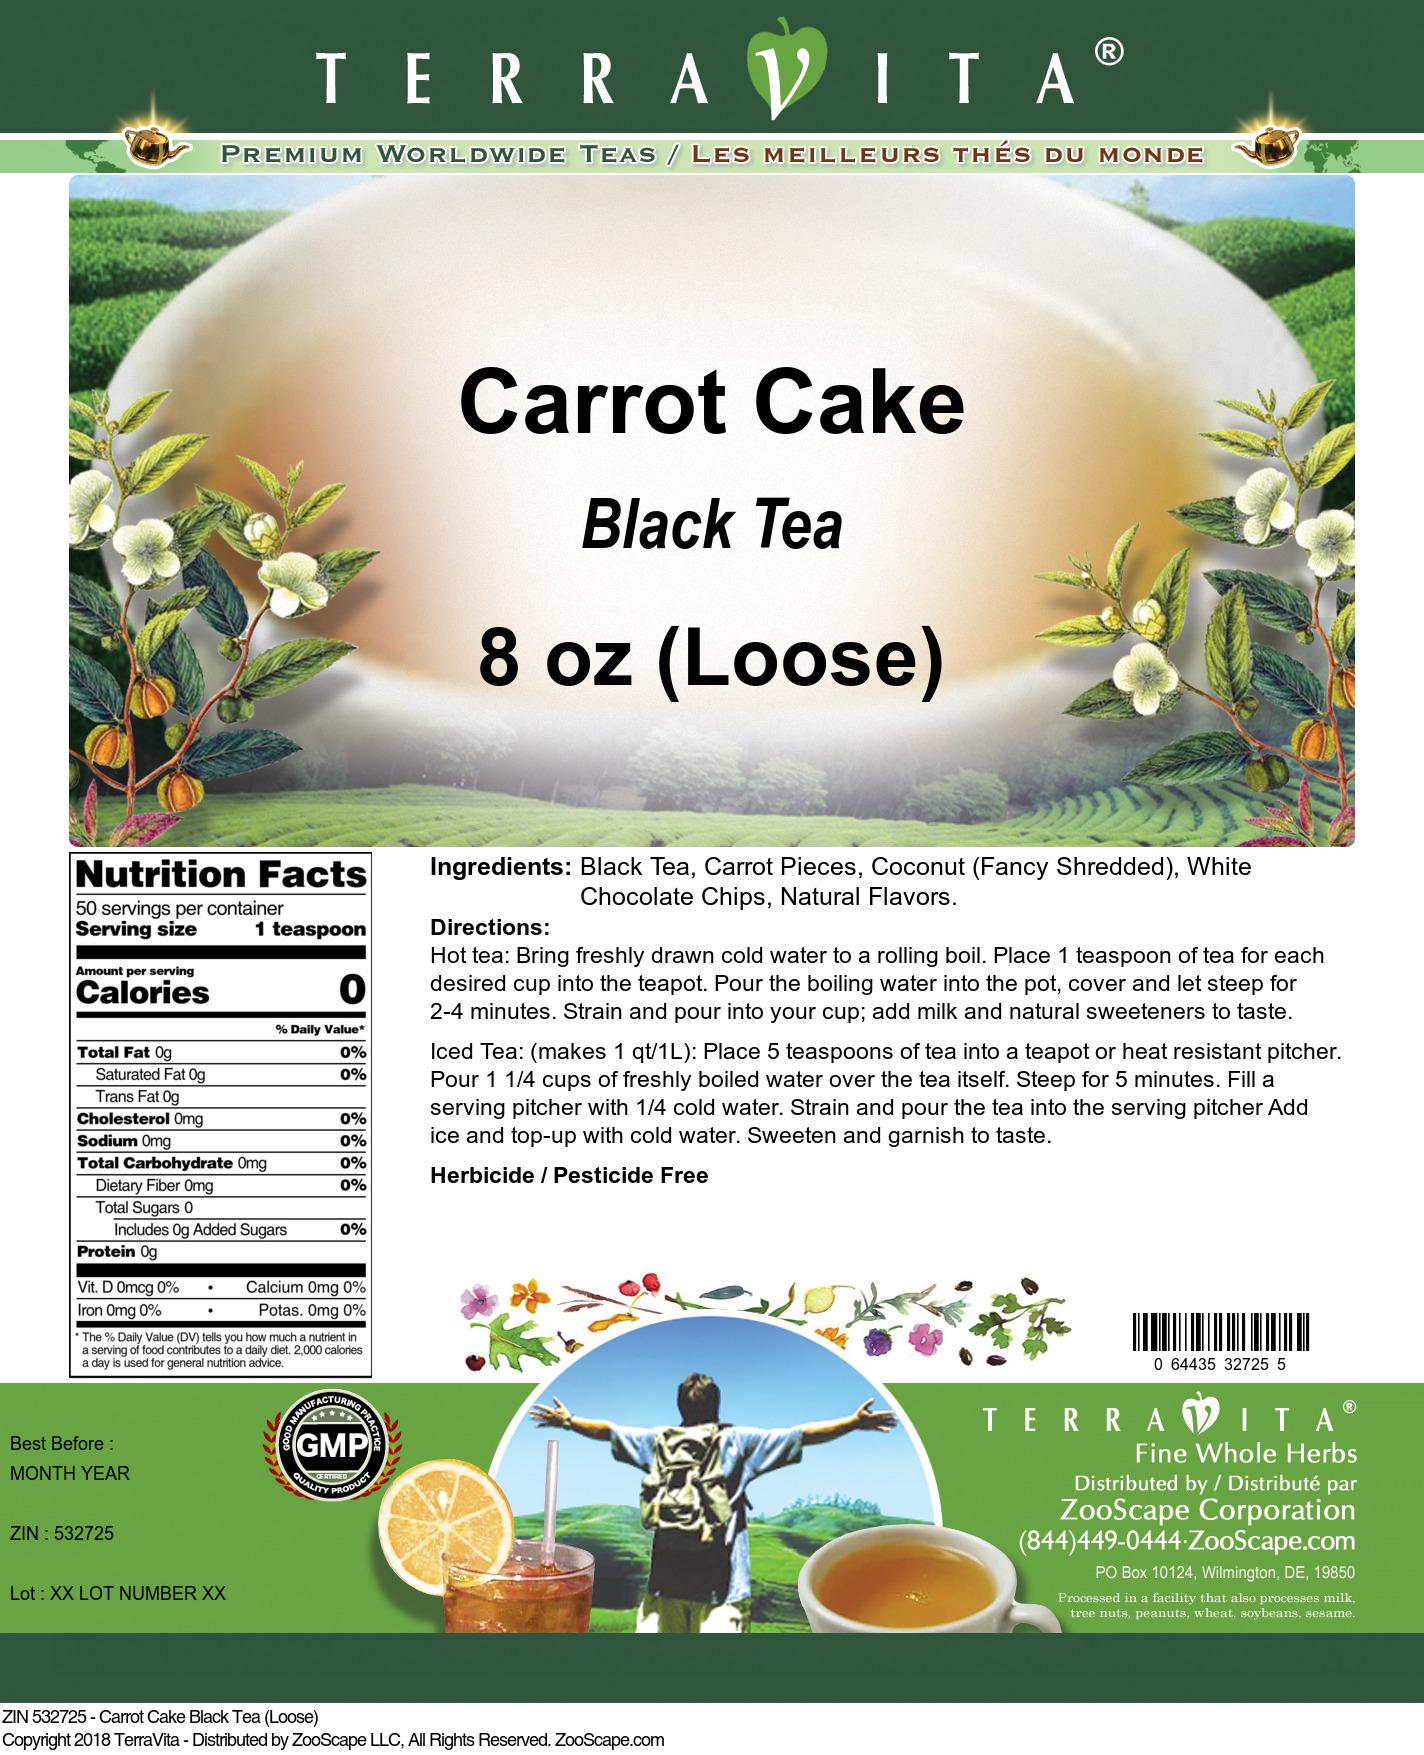 Carrot Cake Black Tea (Loose)